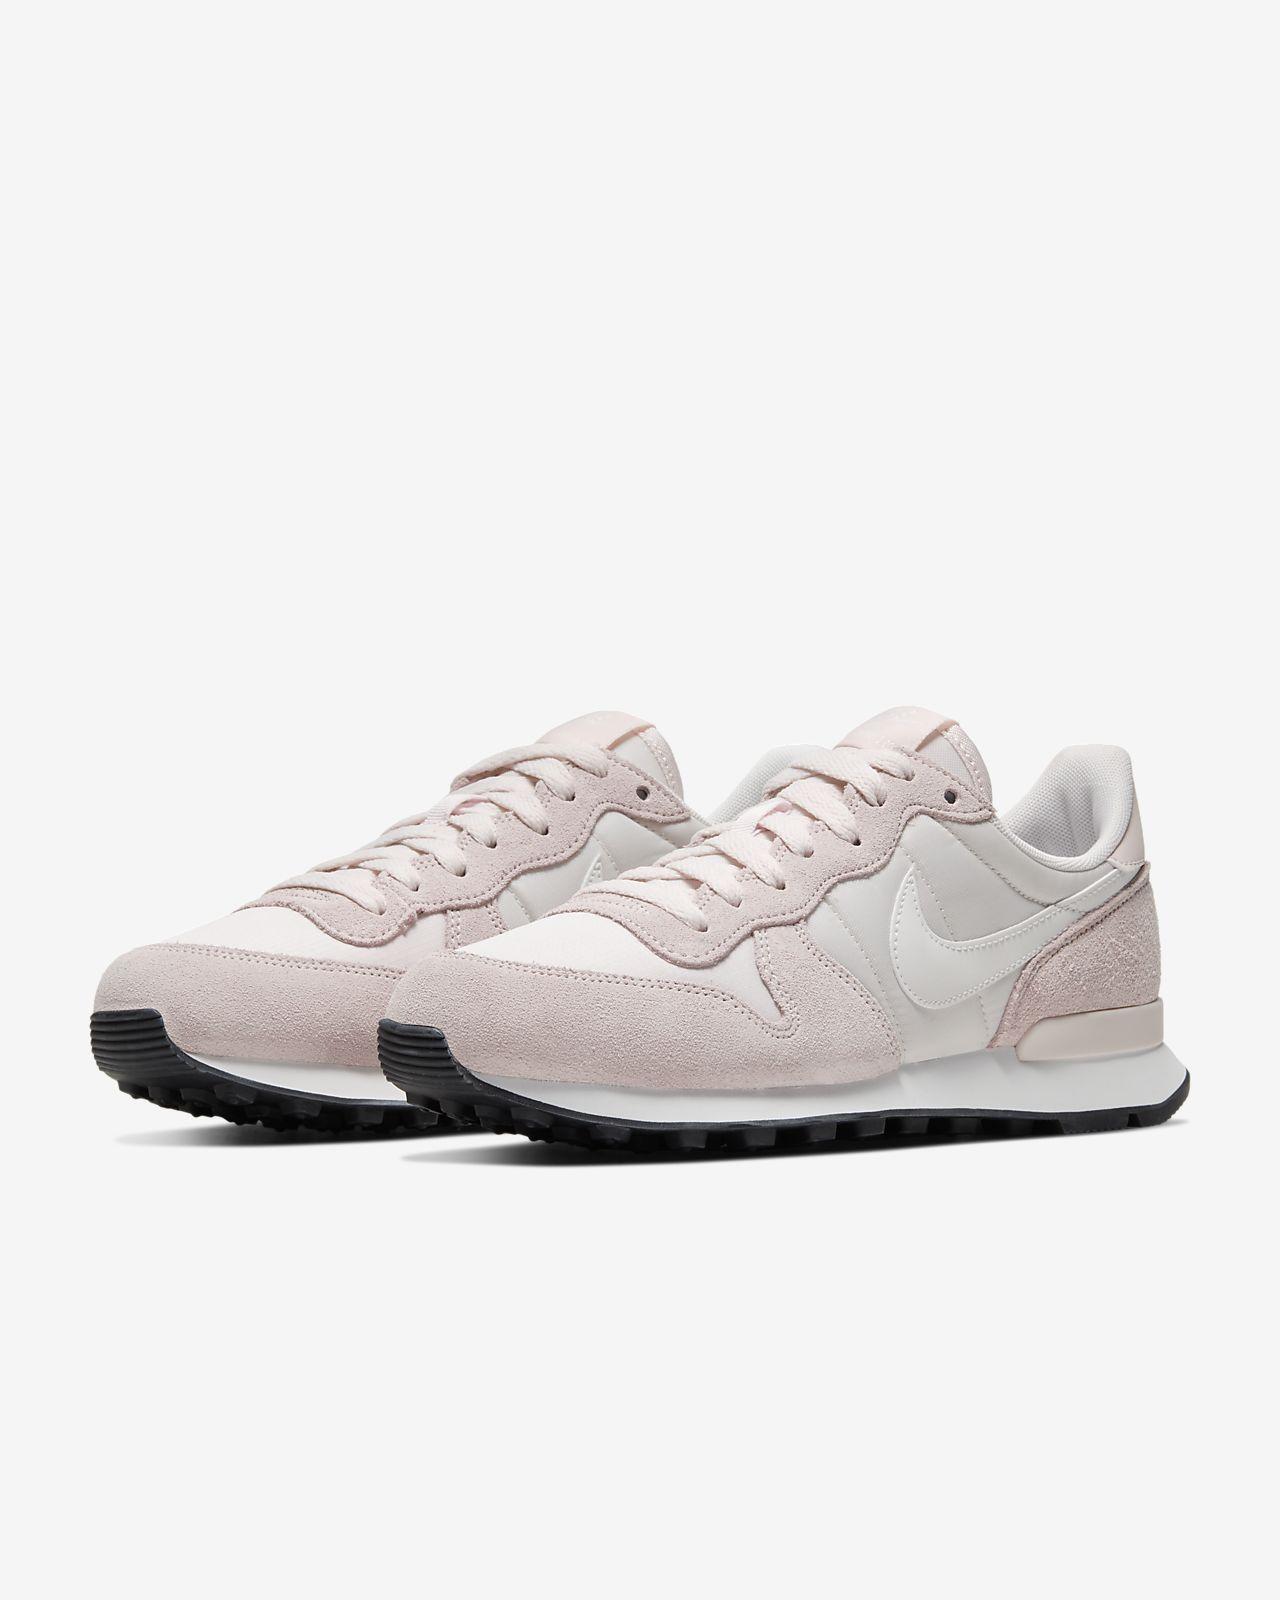 Nike Internationalist Women's Shoe. Nike BG